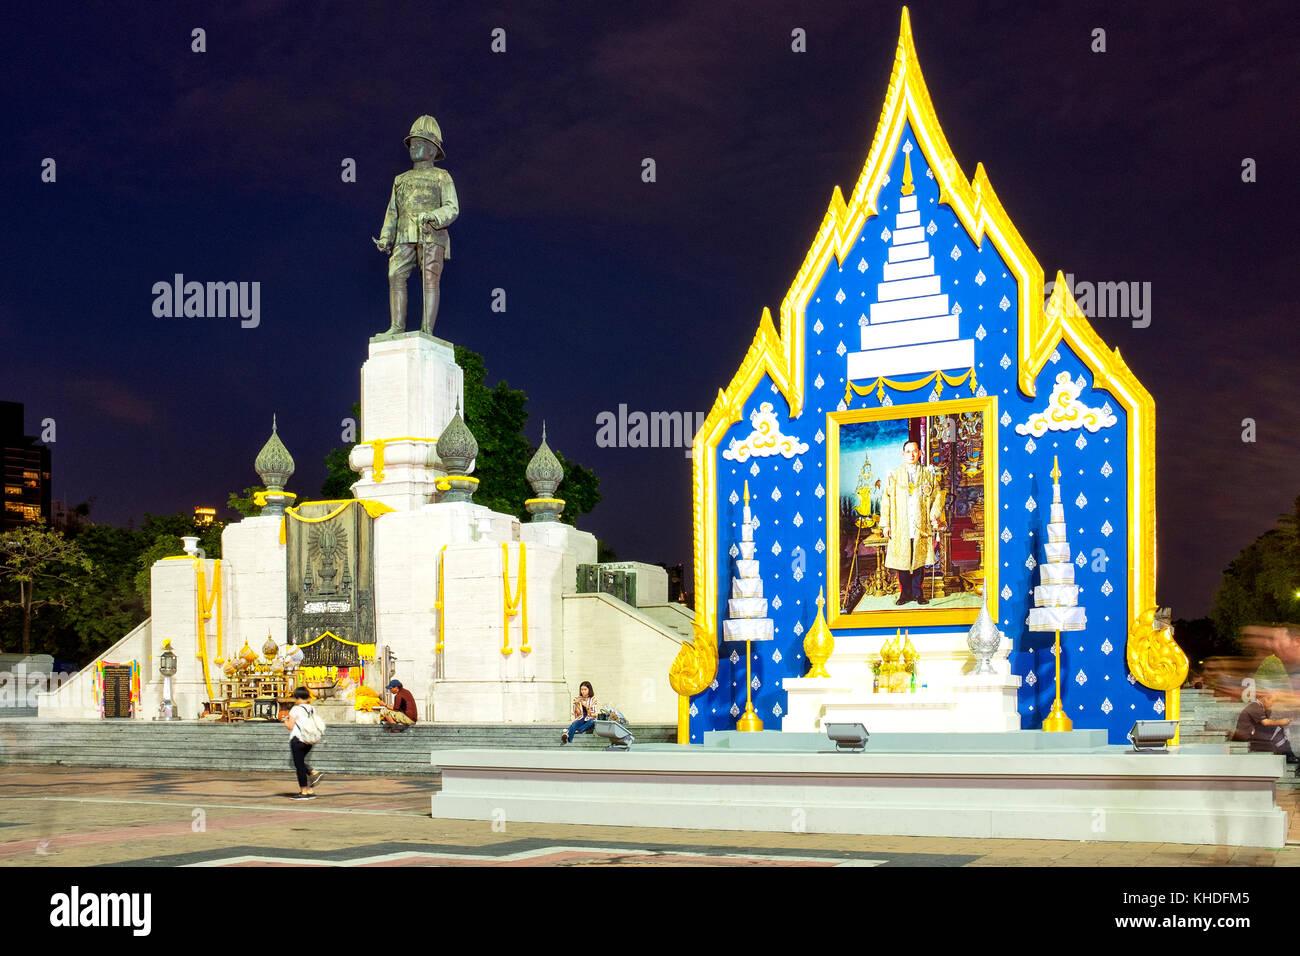 King Rama V statue and tribute to King Bhumibol Adulyadej, Bangkok, Thailand - Stock Image